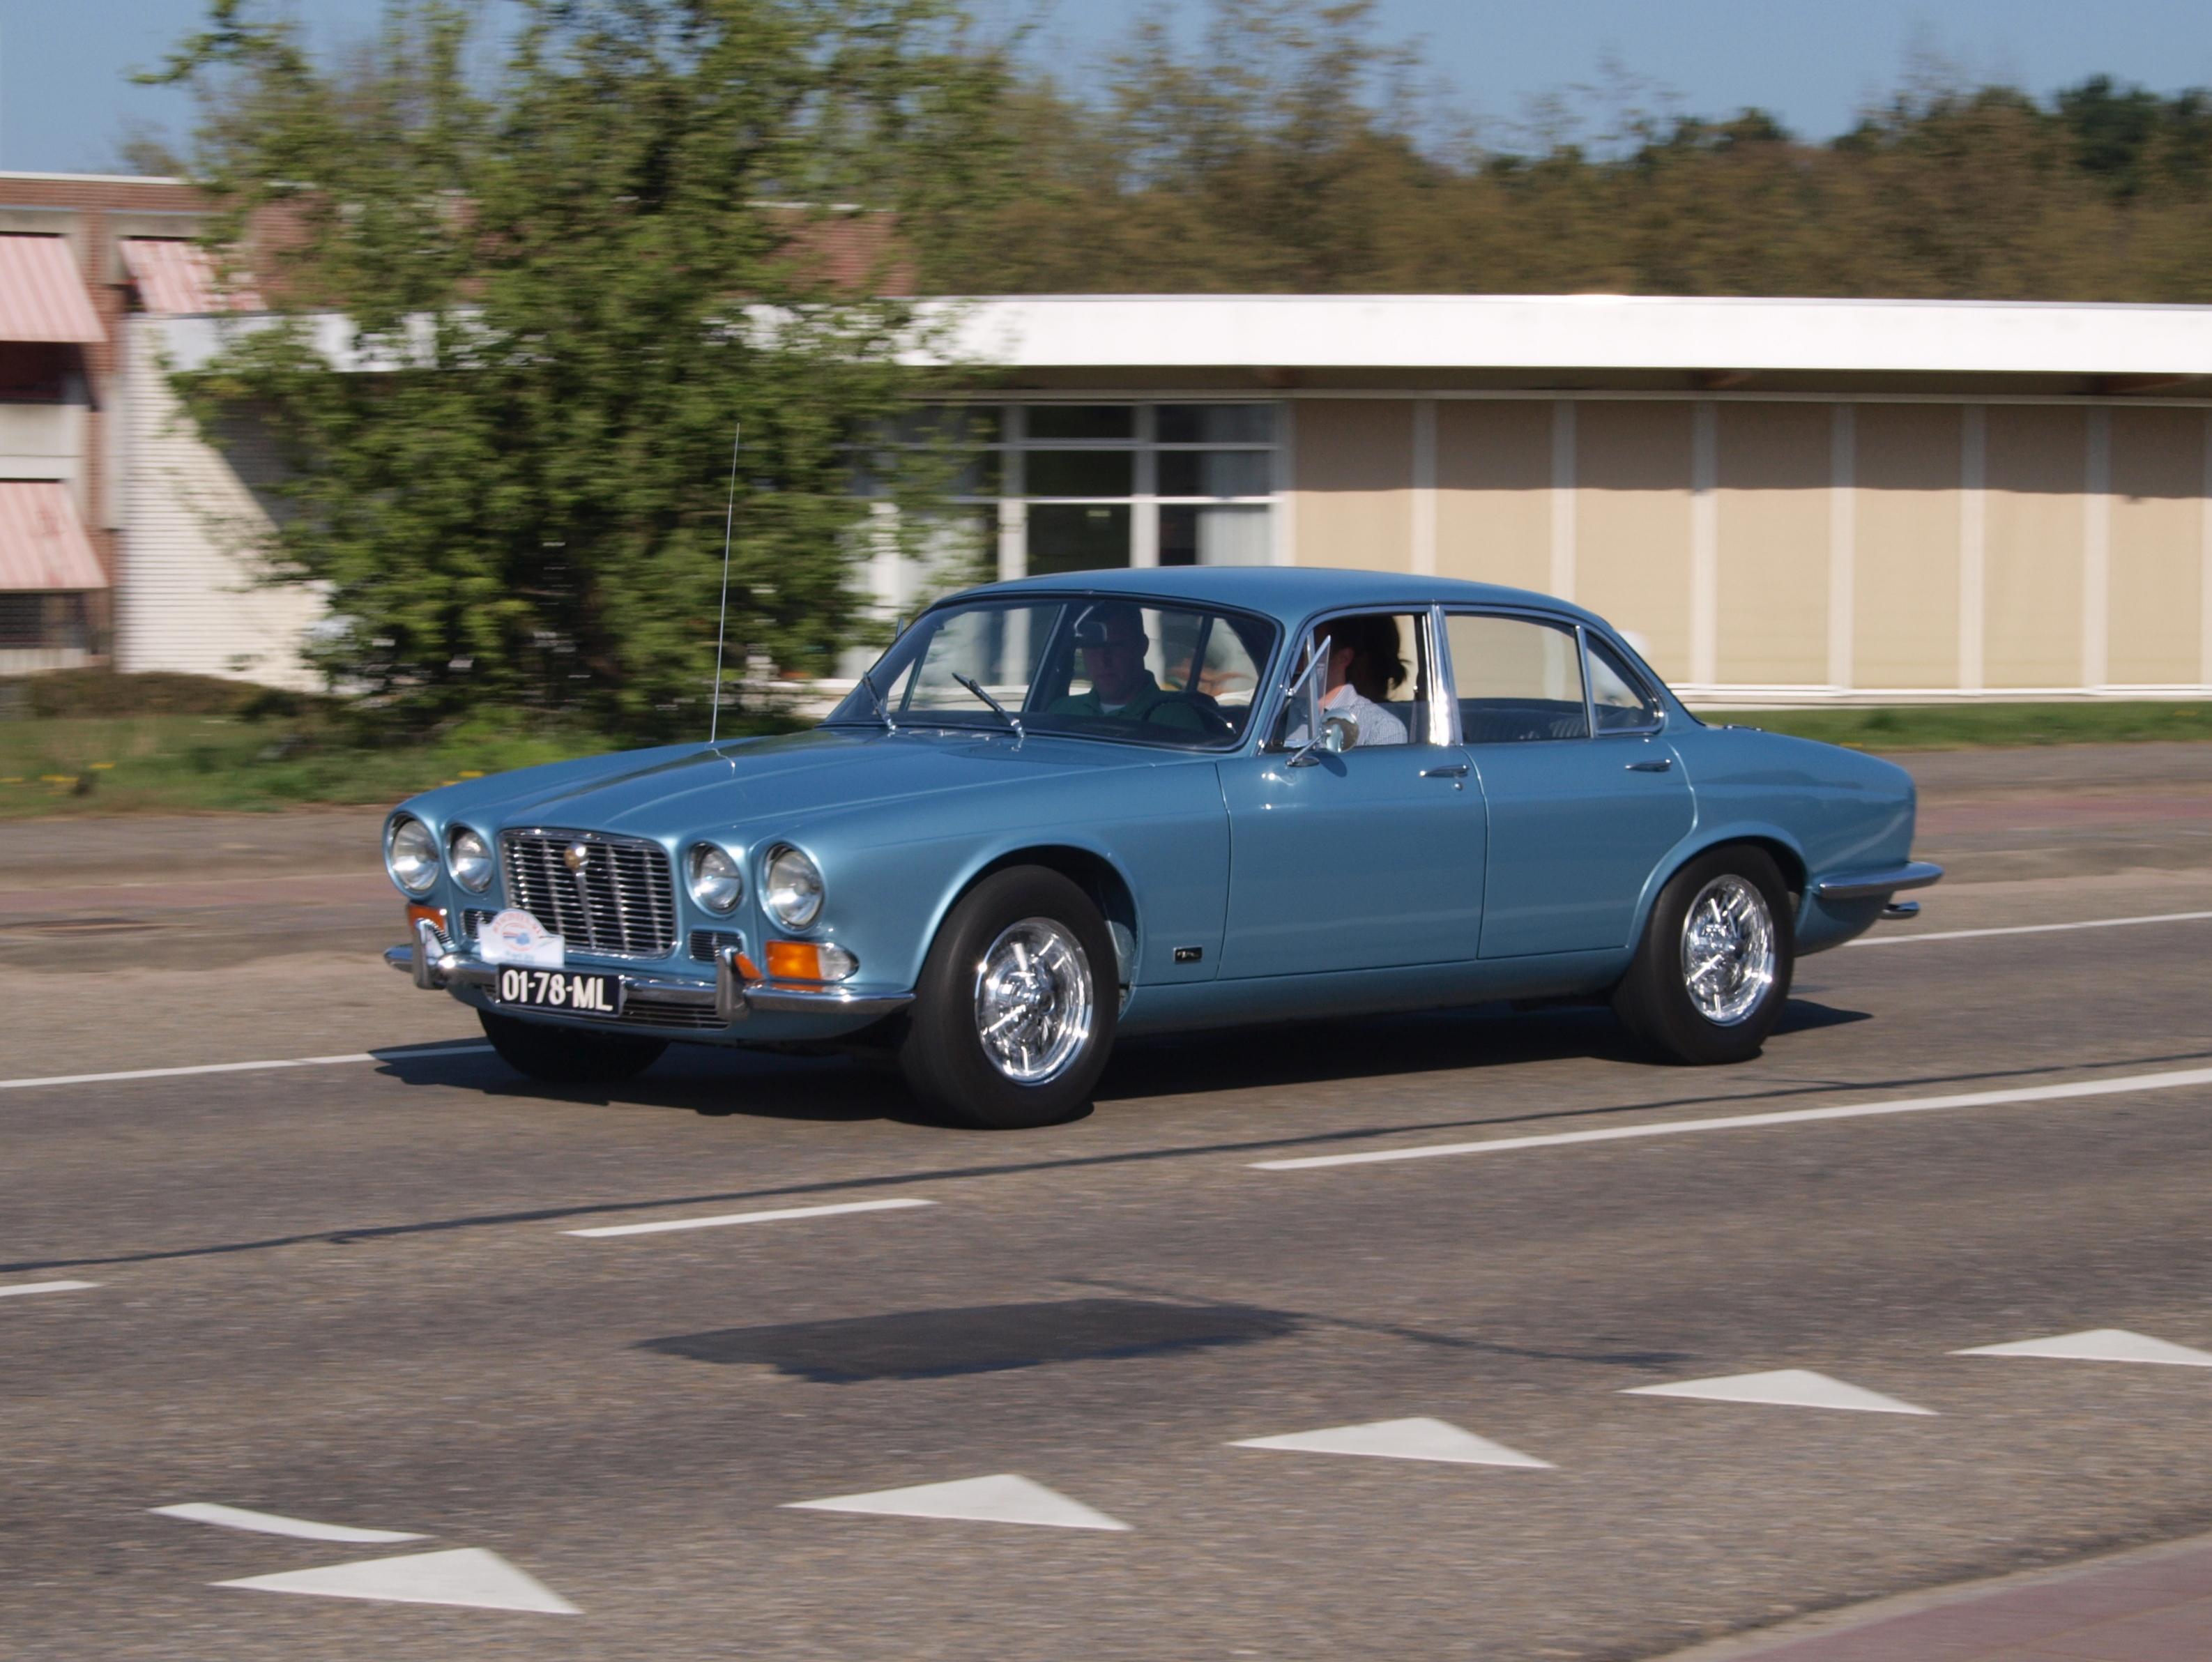 File:Jaguar XJ6-4.2 (1970), Dutch licecence registration 01-78-ML, pic2.JPG - Wikimedia Commons